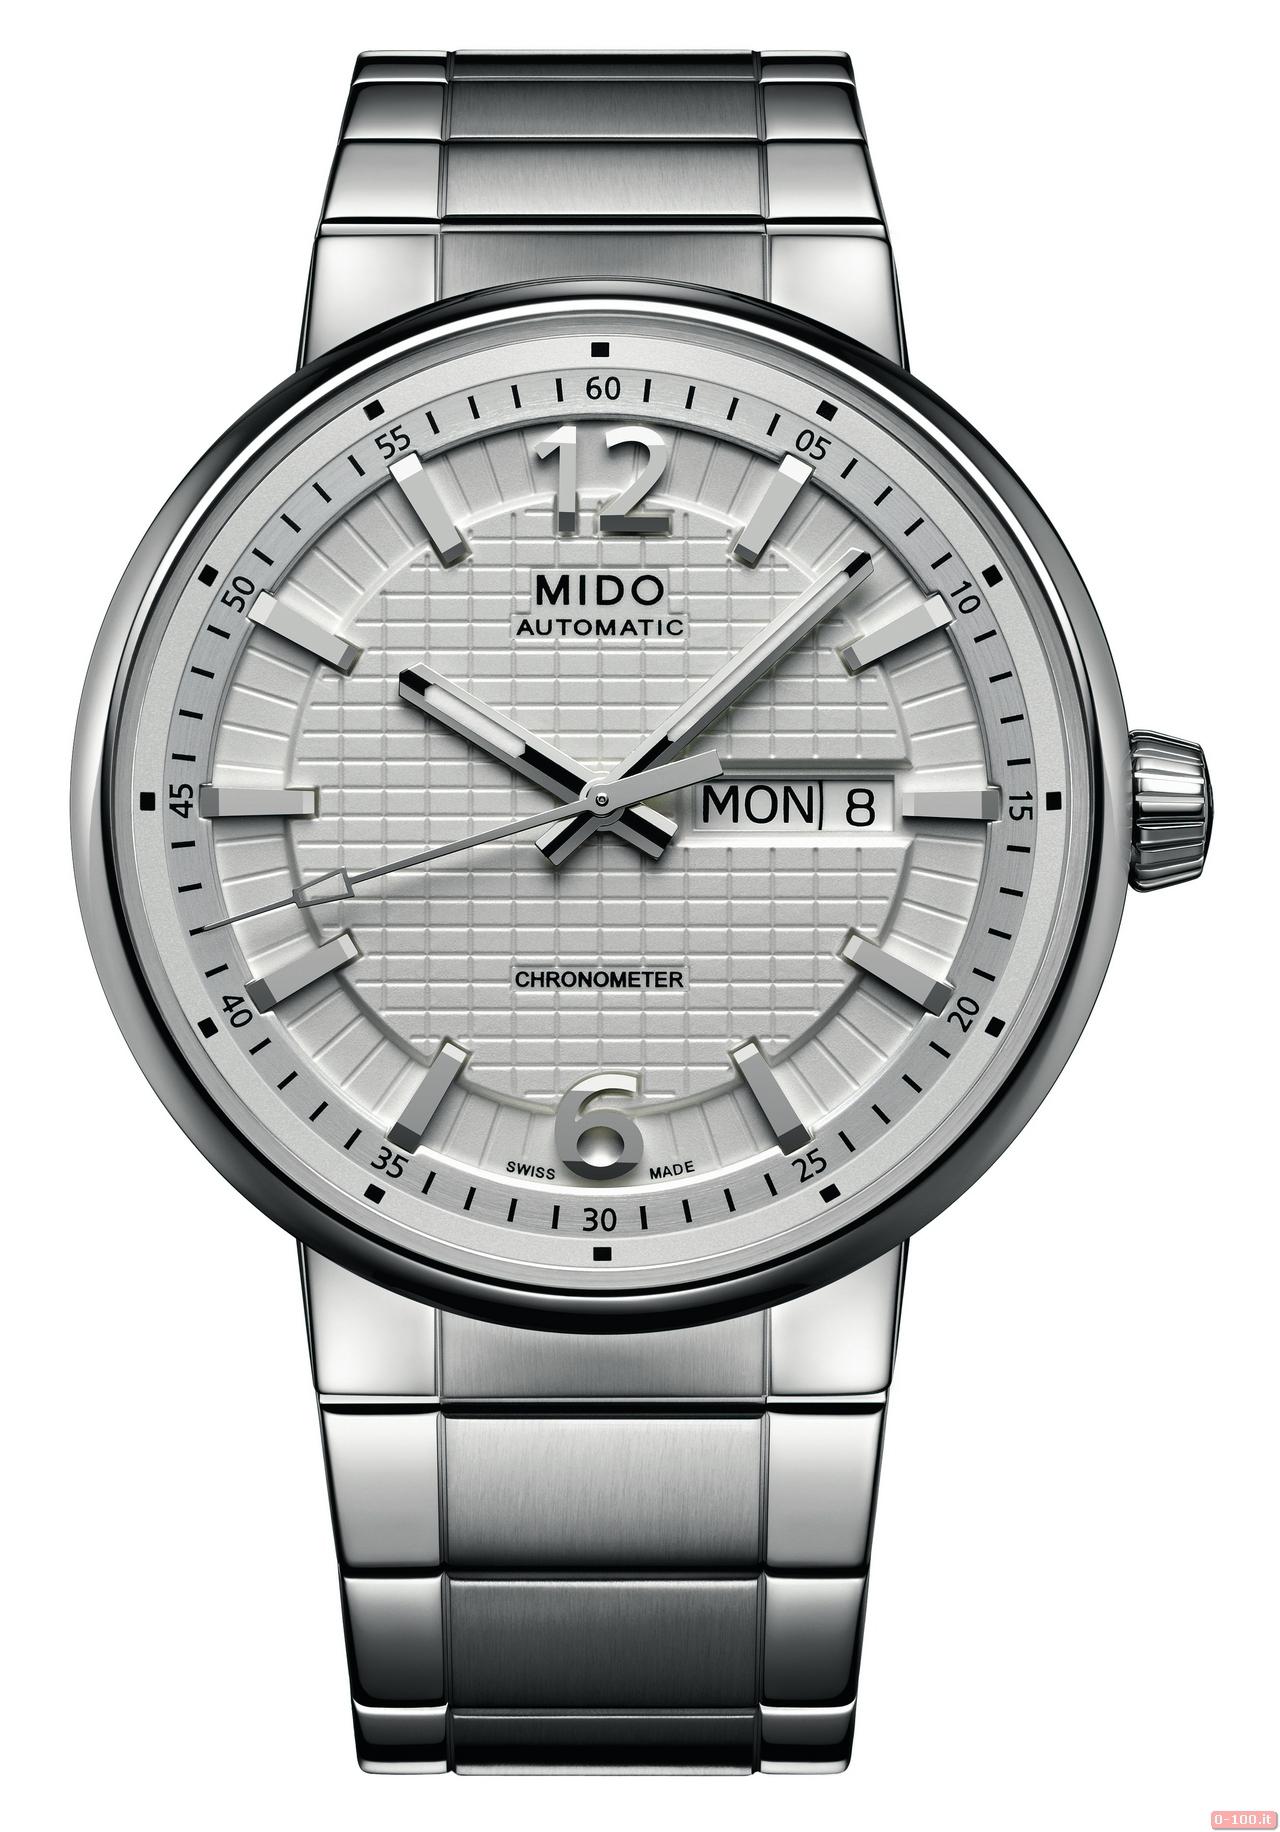 baselworld-2013-mido-great-wall_0-100 -